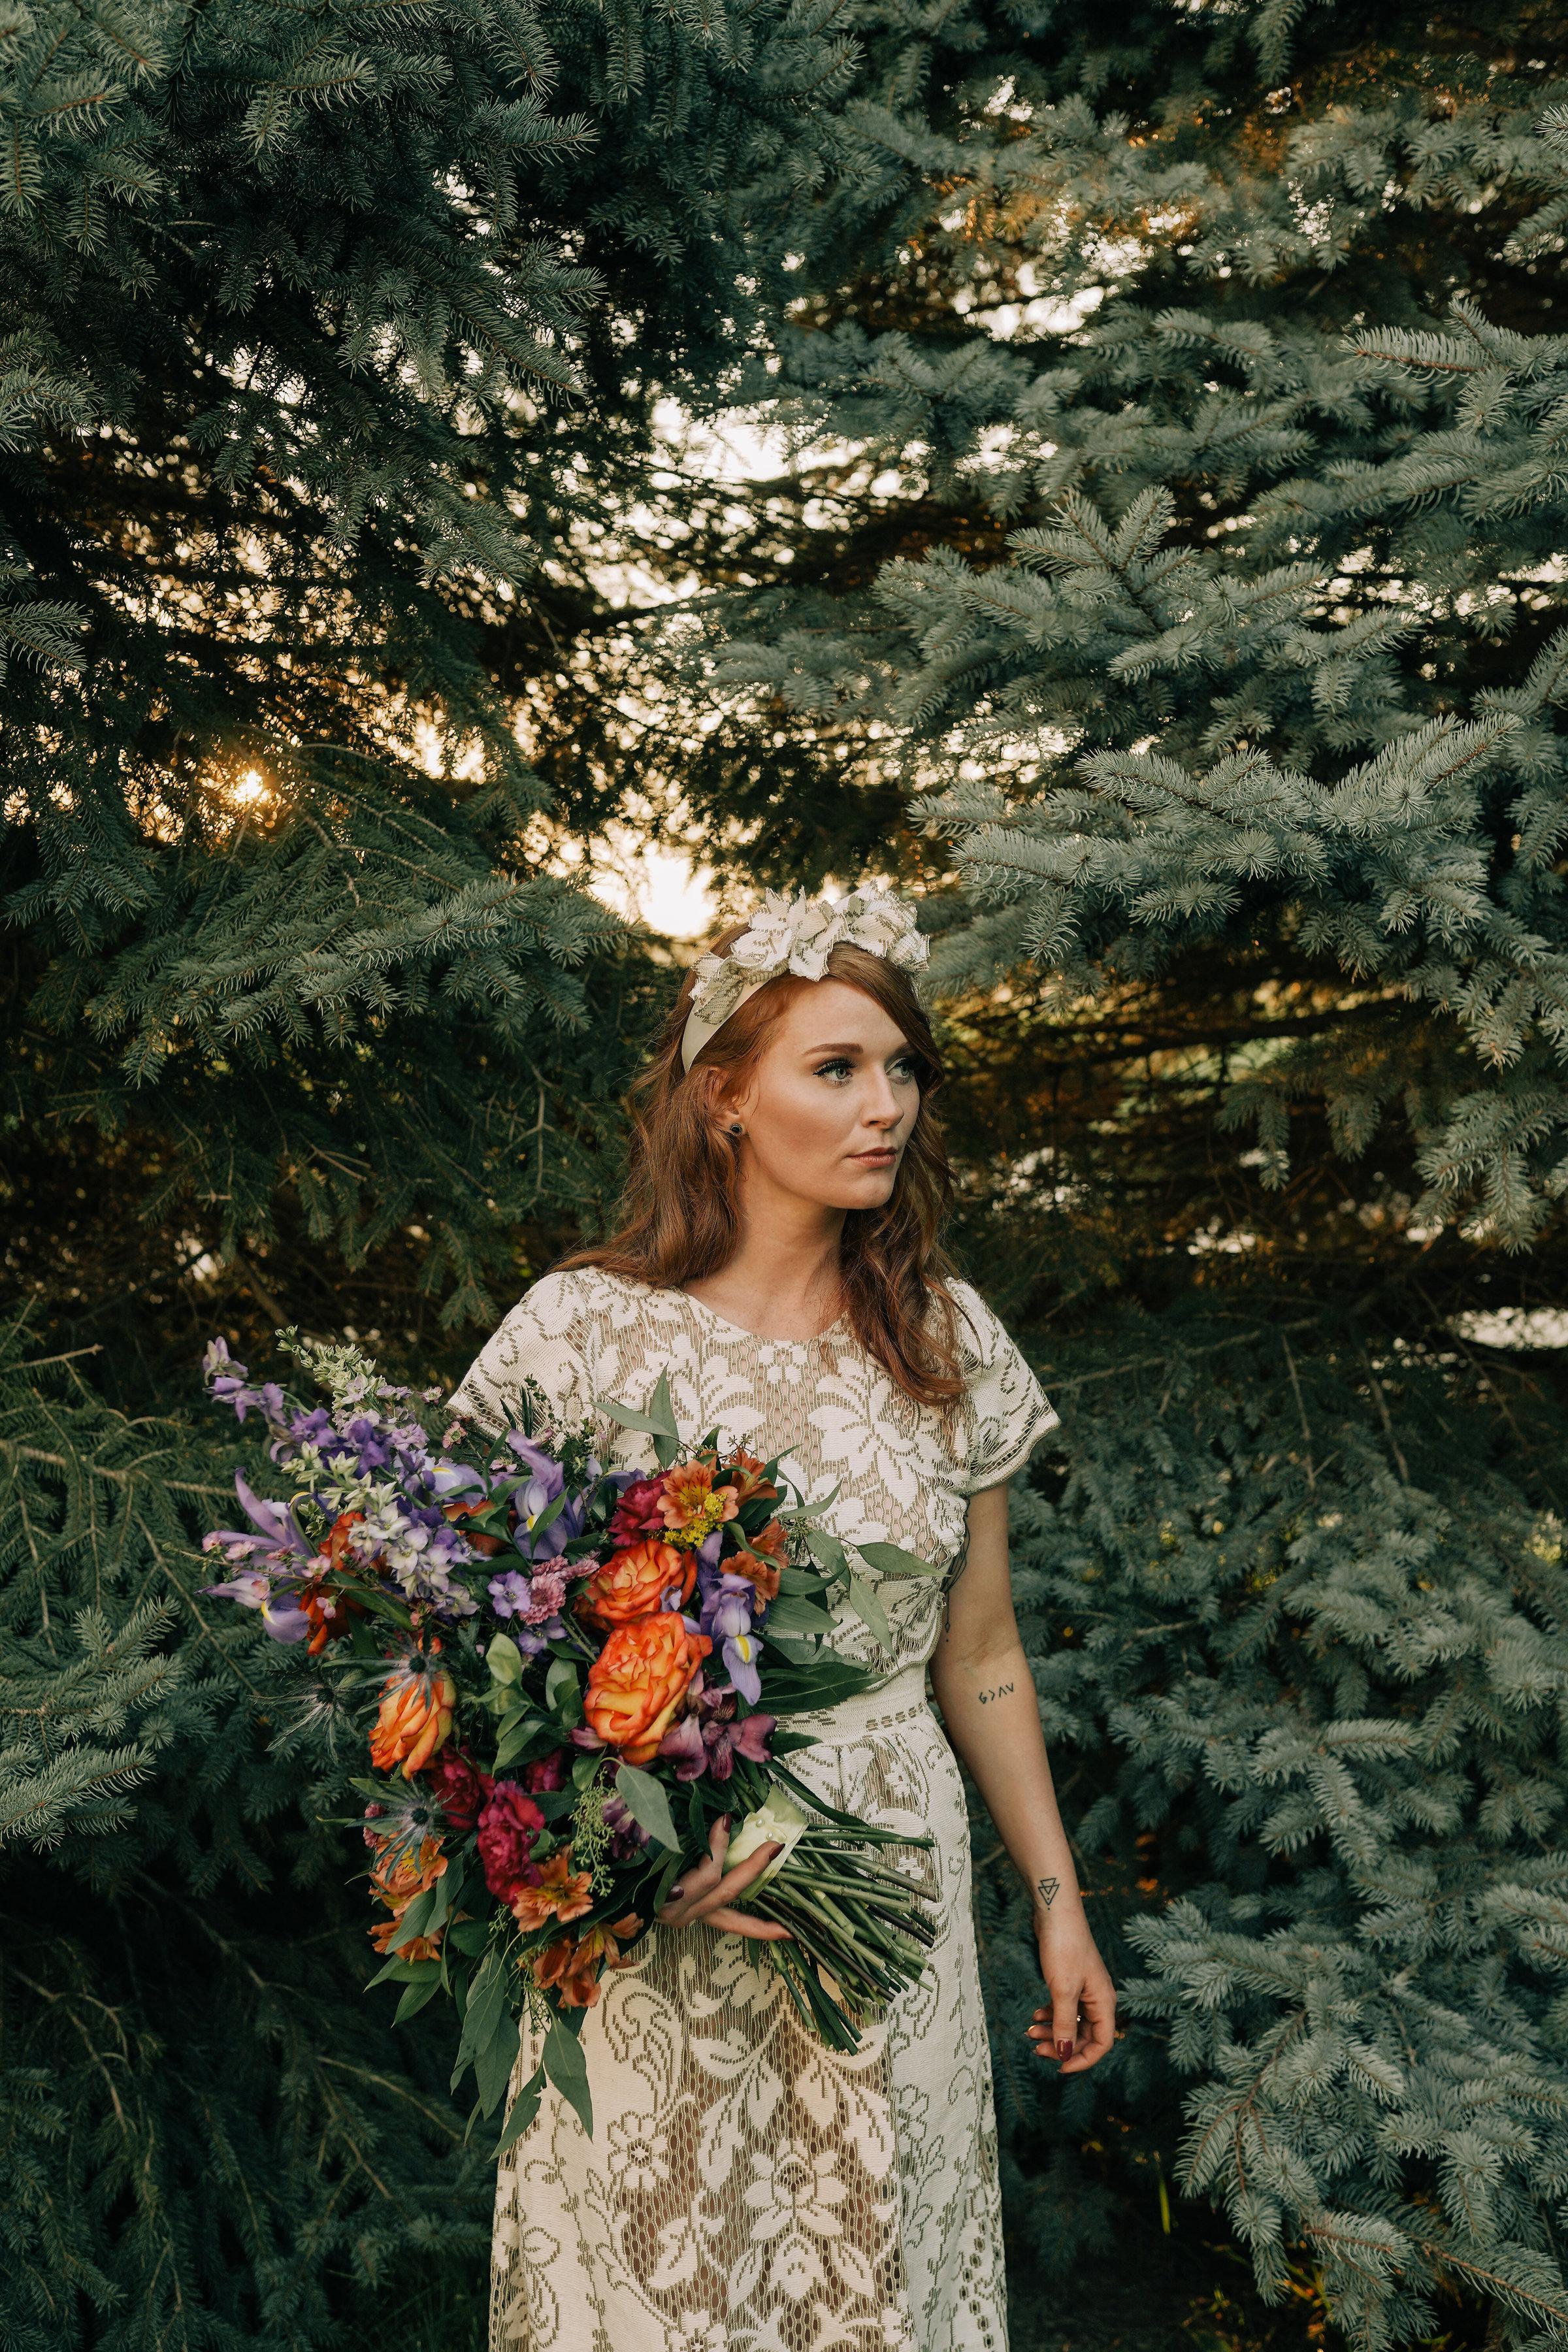 myrtle-mae-iris-aisle-dame-maiden-lavender-blue-floral-raelyn-ramey-photography-49.jpg